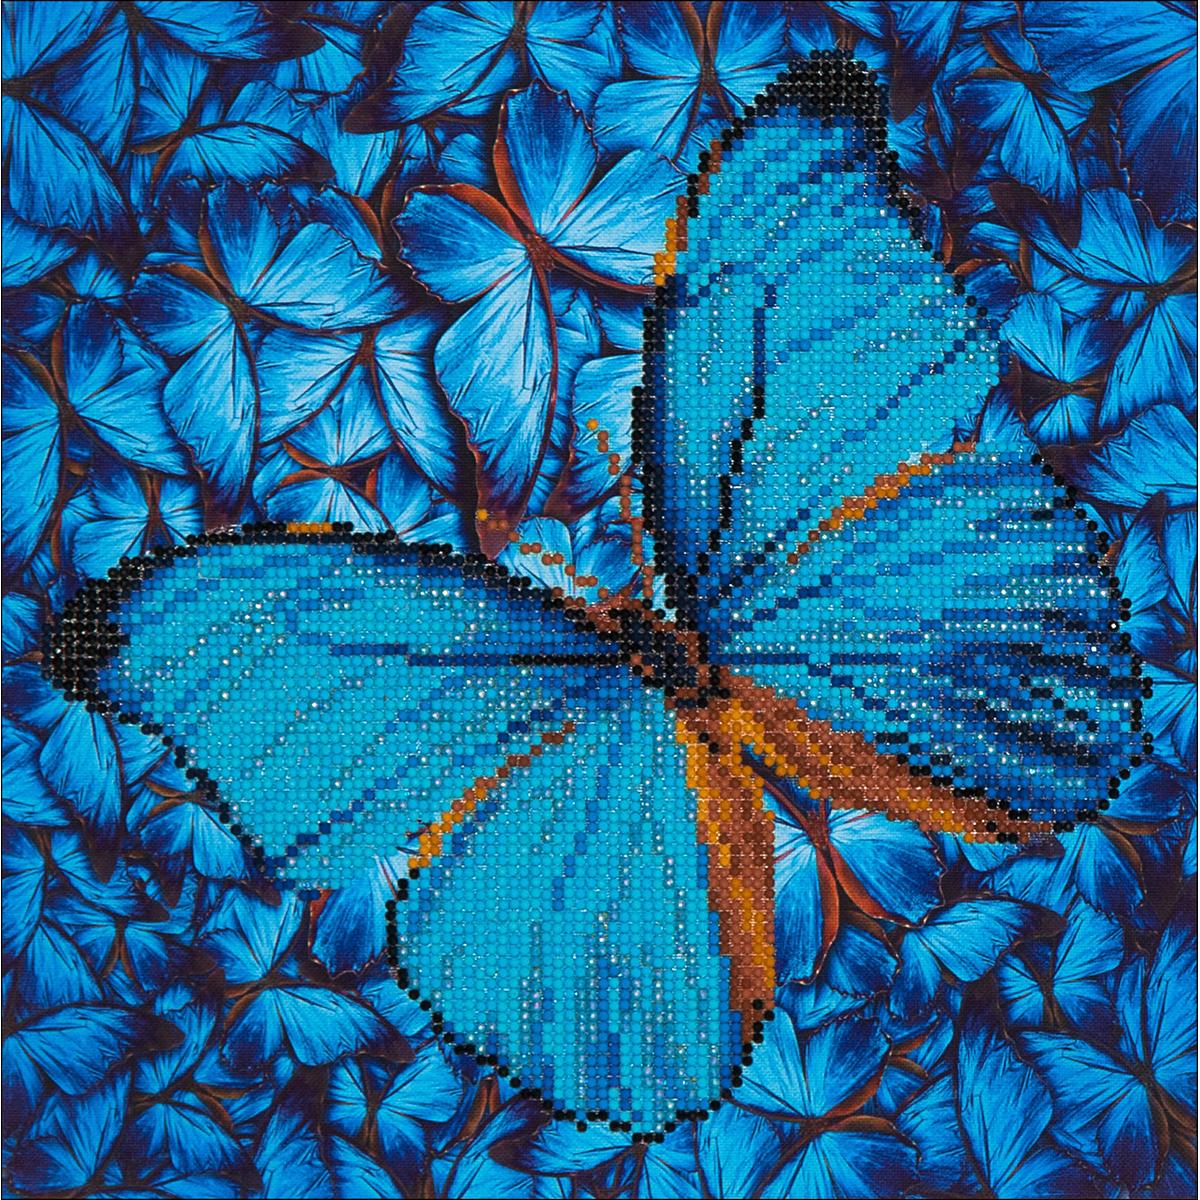 Diamond Dotz Diamond Embroidery Facet Art Kit 15X15-Flutter By Blue